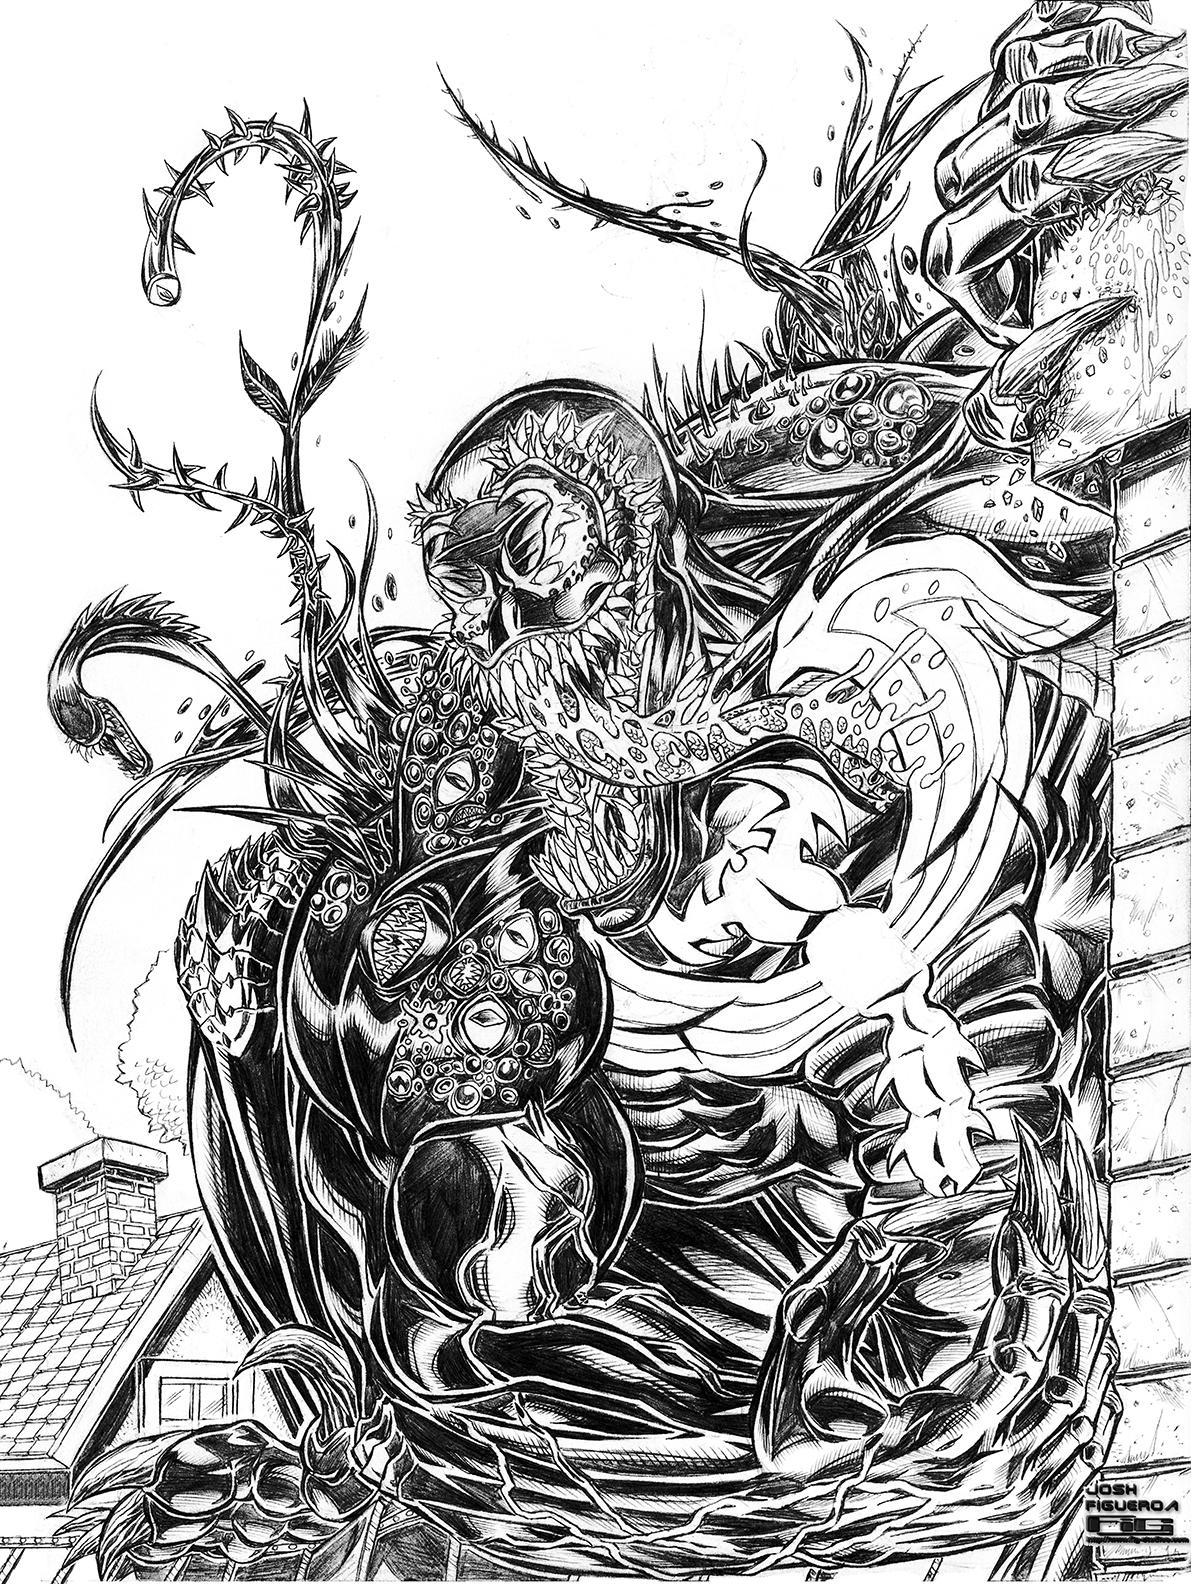 Venom Commission (pencil)